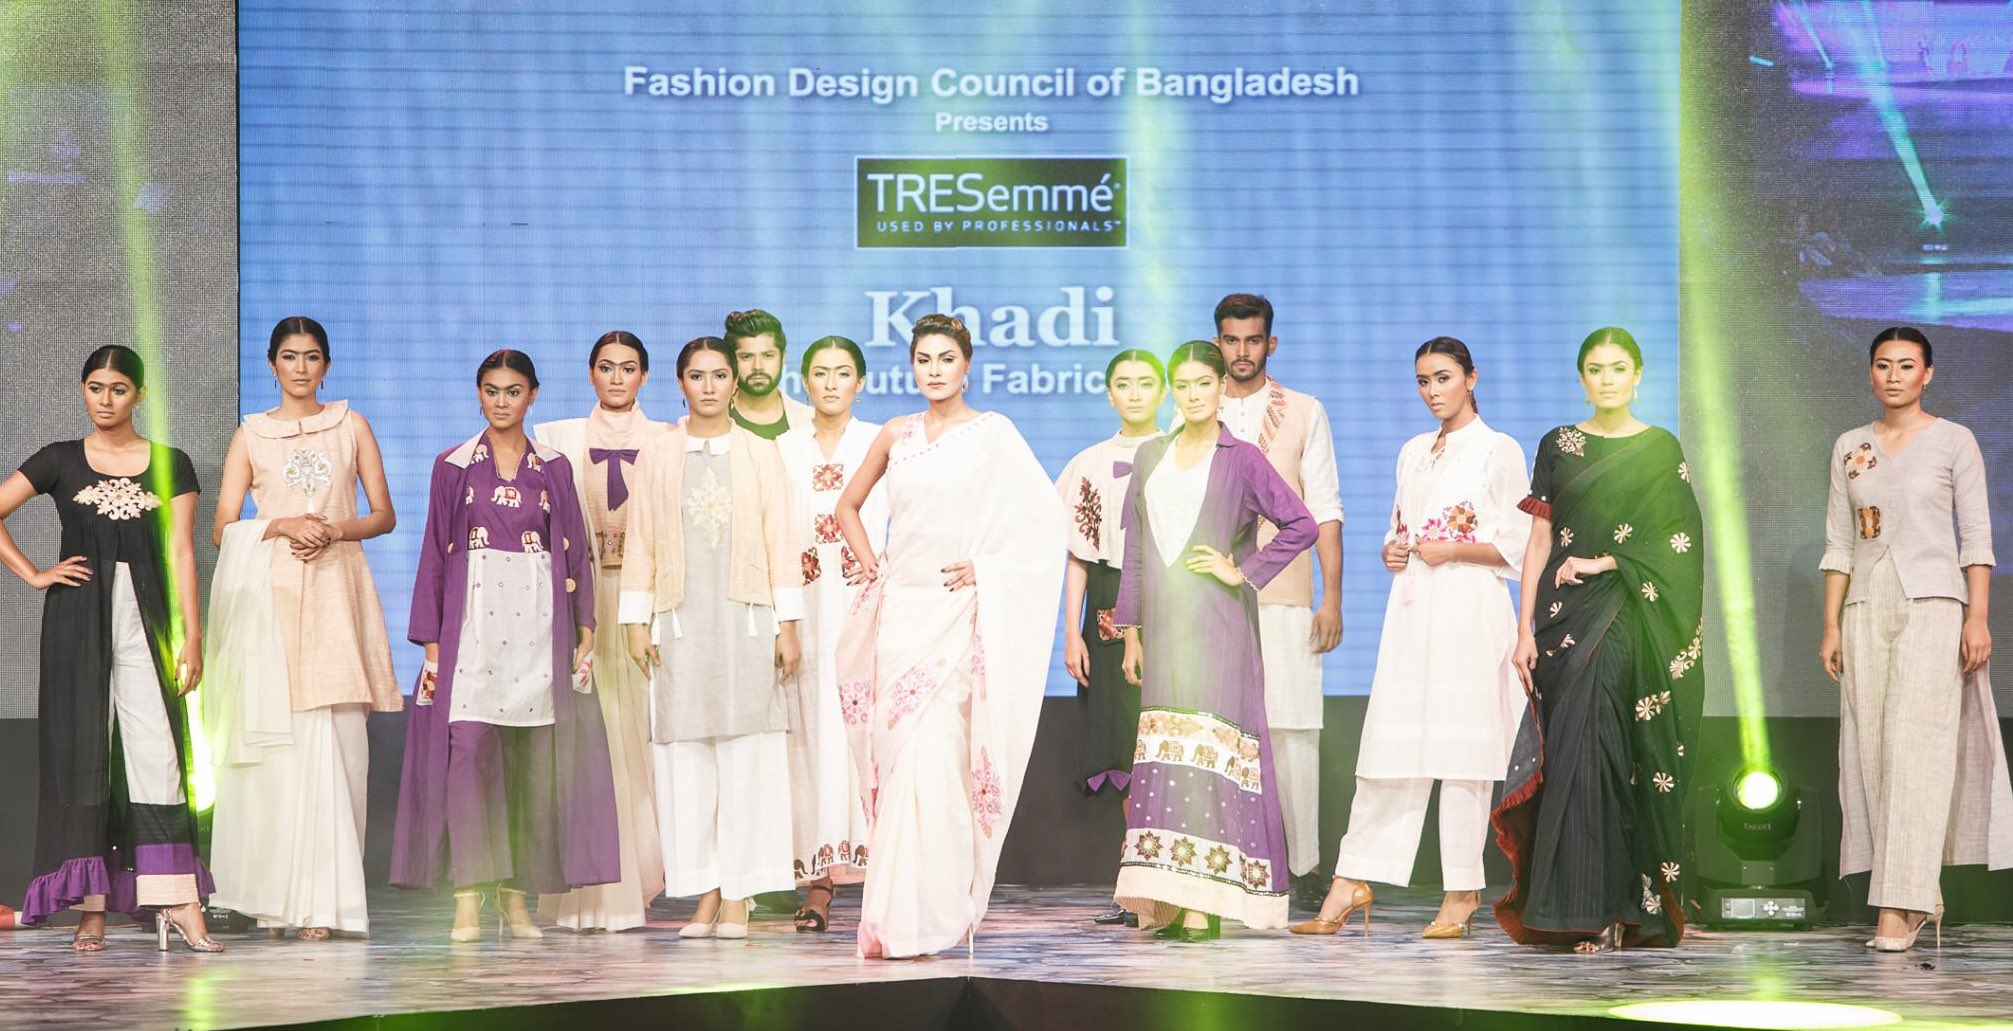 Ezmat Naz Haque On Twitter Khadicollection Handloom Localmaterial Dhaka Rimanaz Fashionista Fashiondesigner Themeshow Woodarttheme Embroidery Https T Co Ycs6vsqfm7